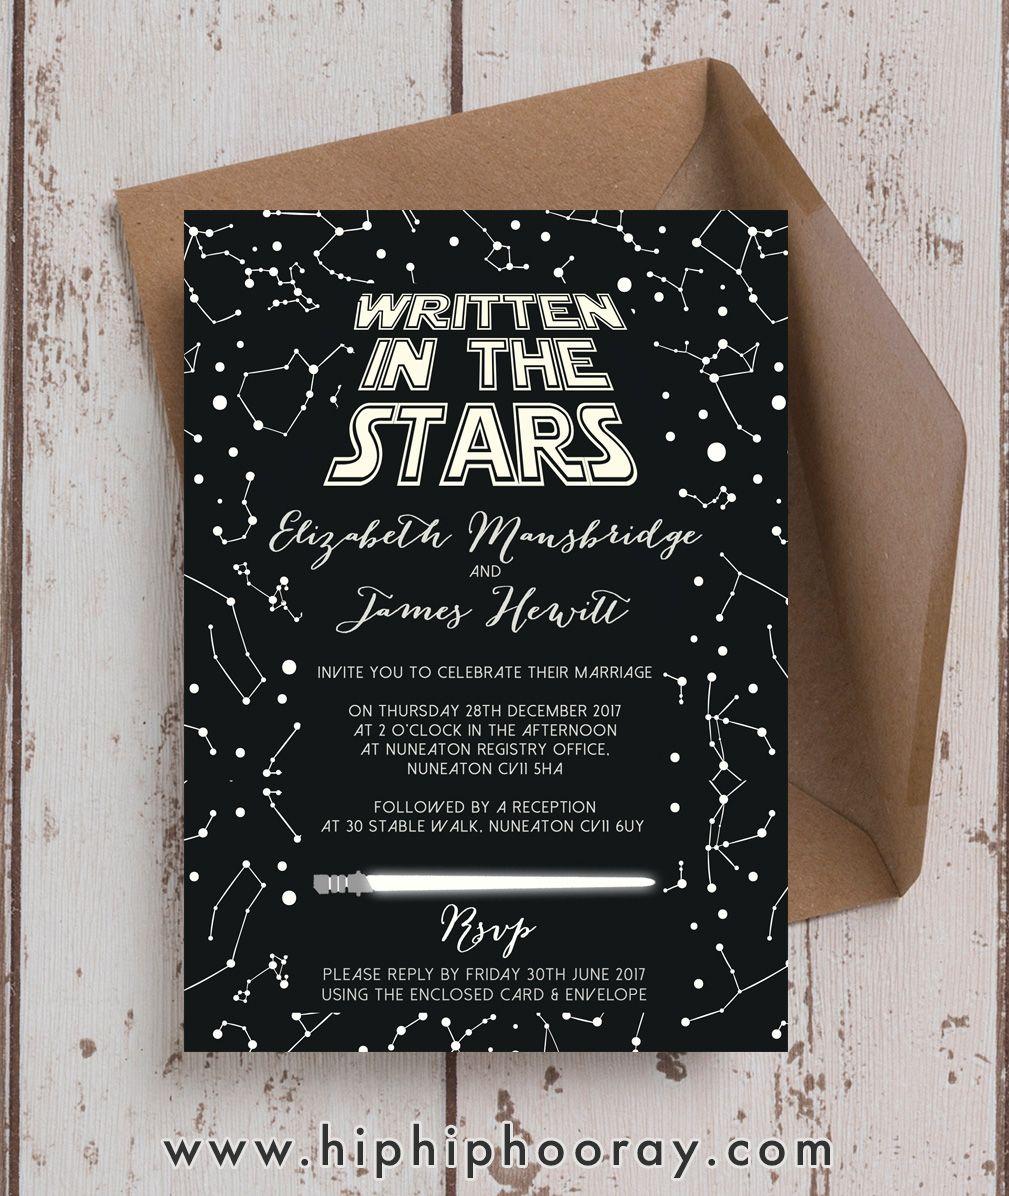 Star Wars Wedding Invitations Amazing Star Wars Themed Inspired Wedding Invitations Invites